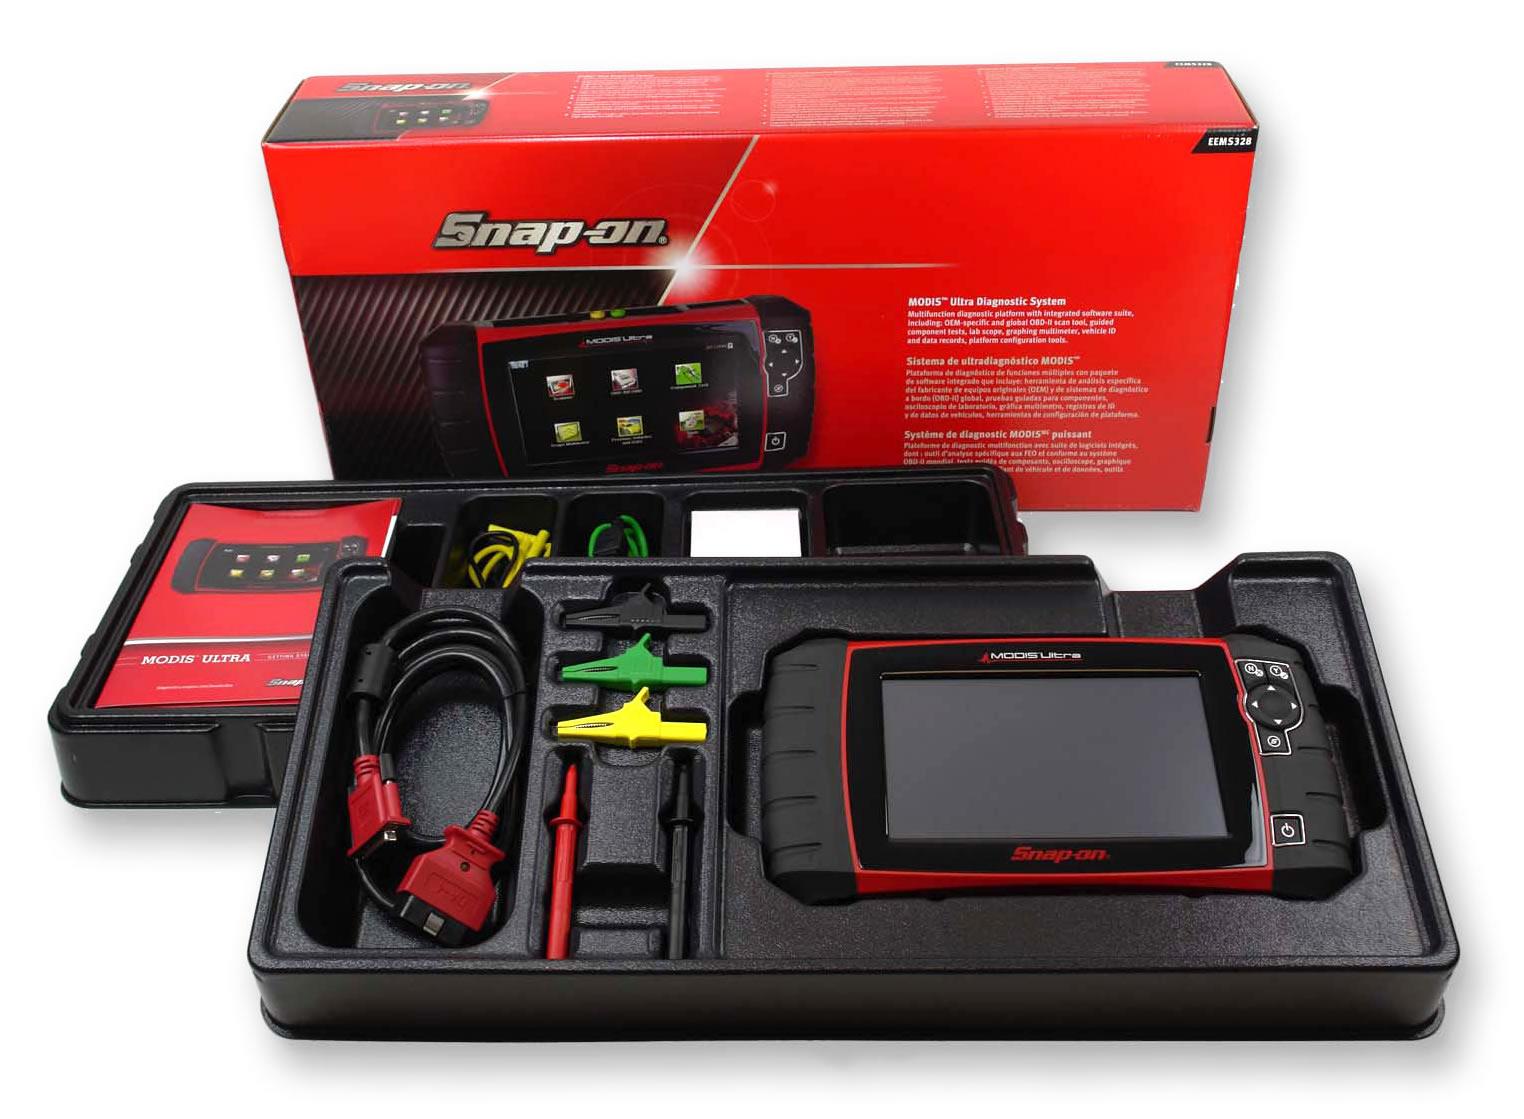 modis ultra obd software snap on diagnostics rh snapon com Snap-on Vantage Pro Training Snap-on Vantage Pro Update